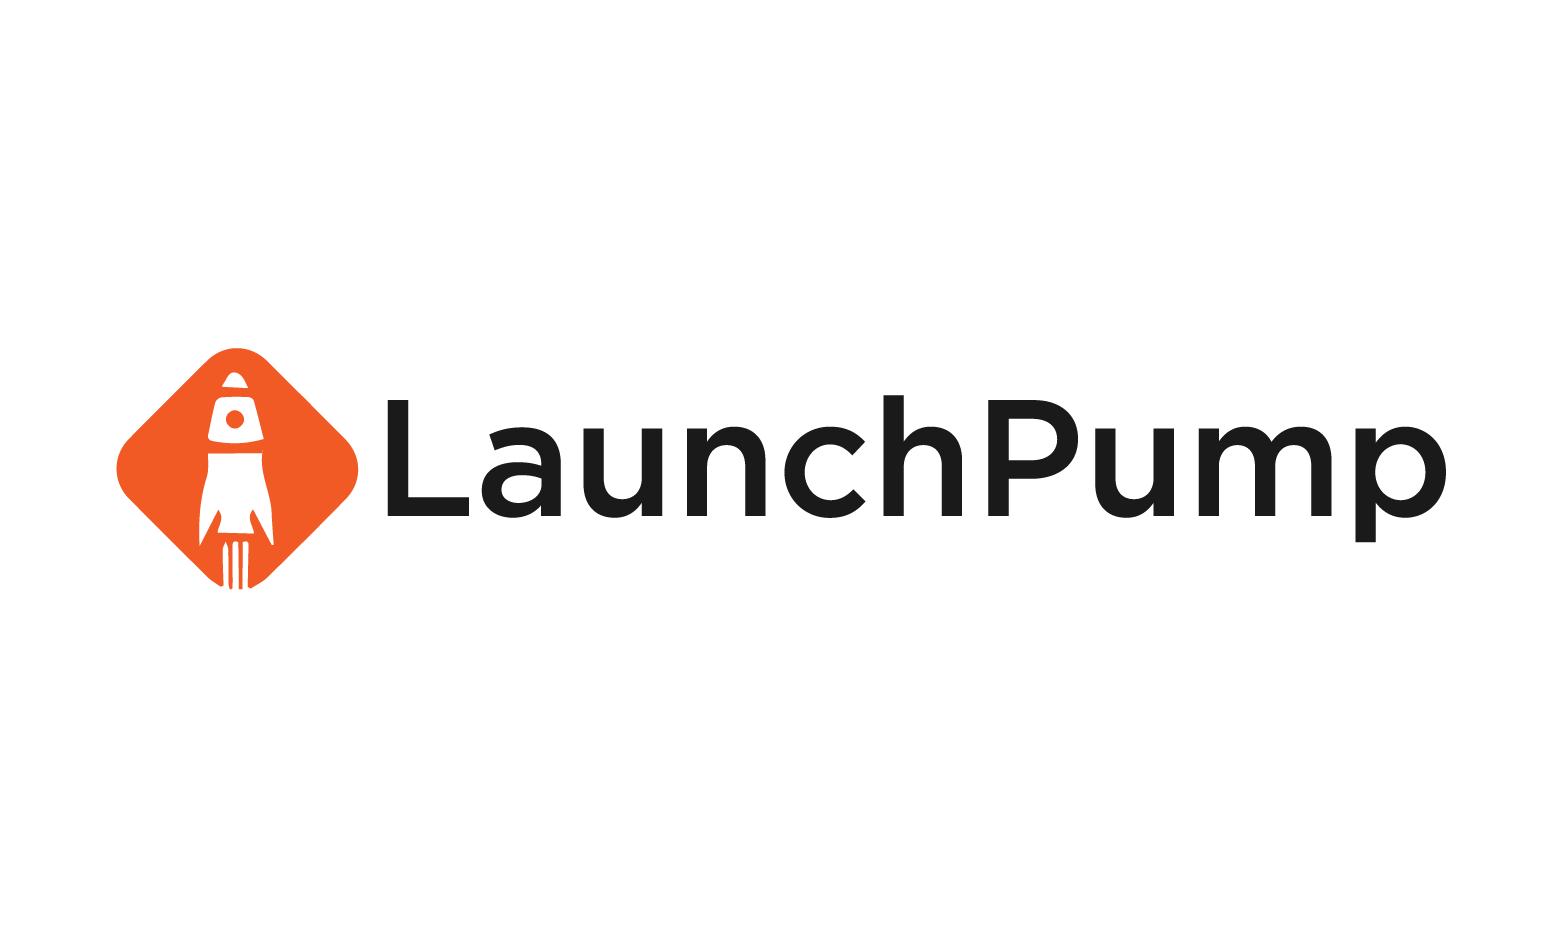 LaunchPump.com